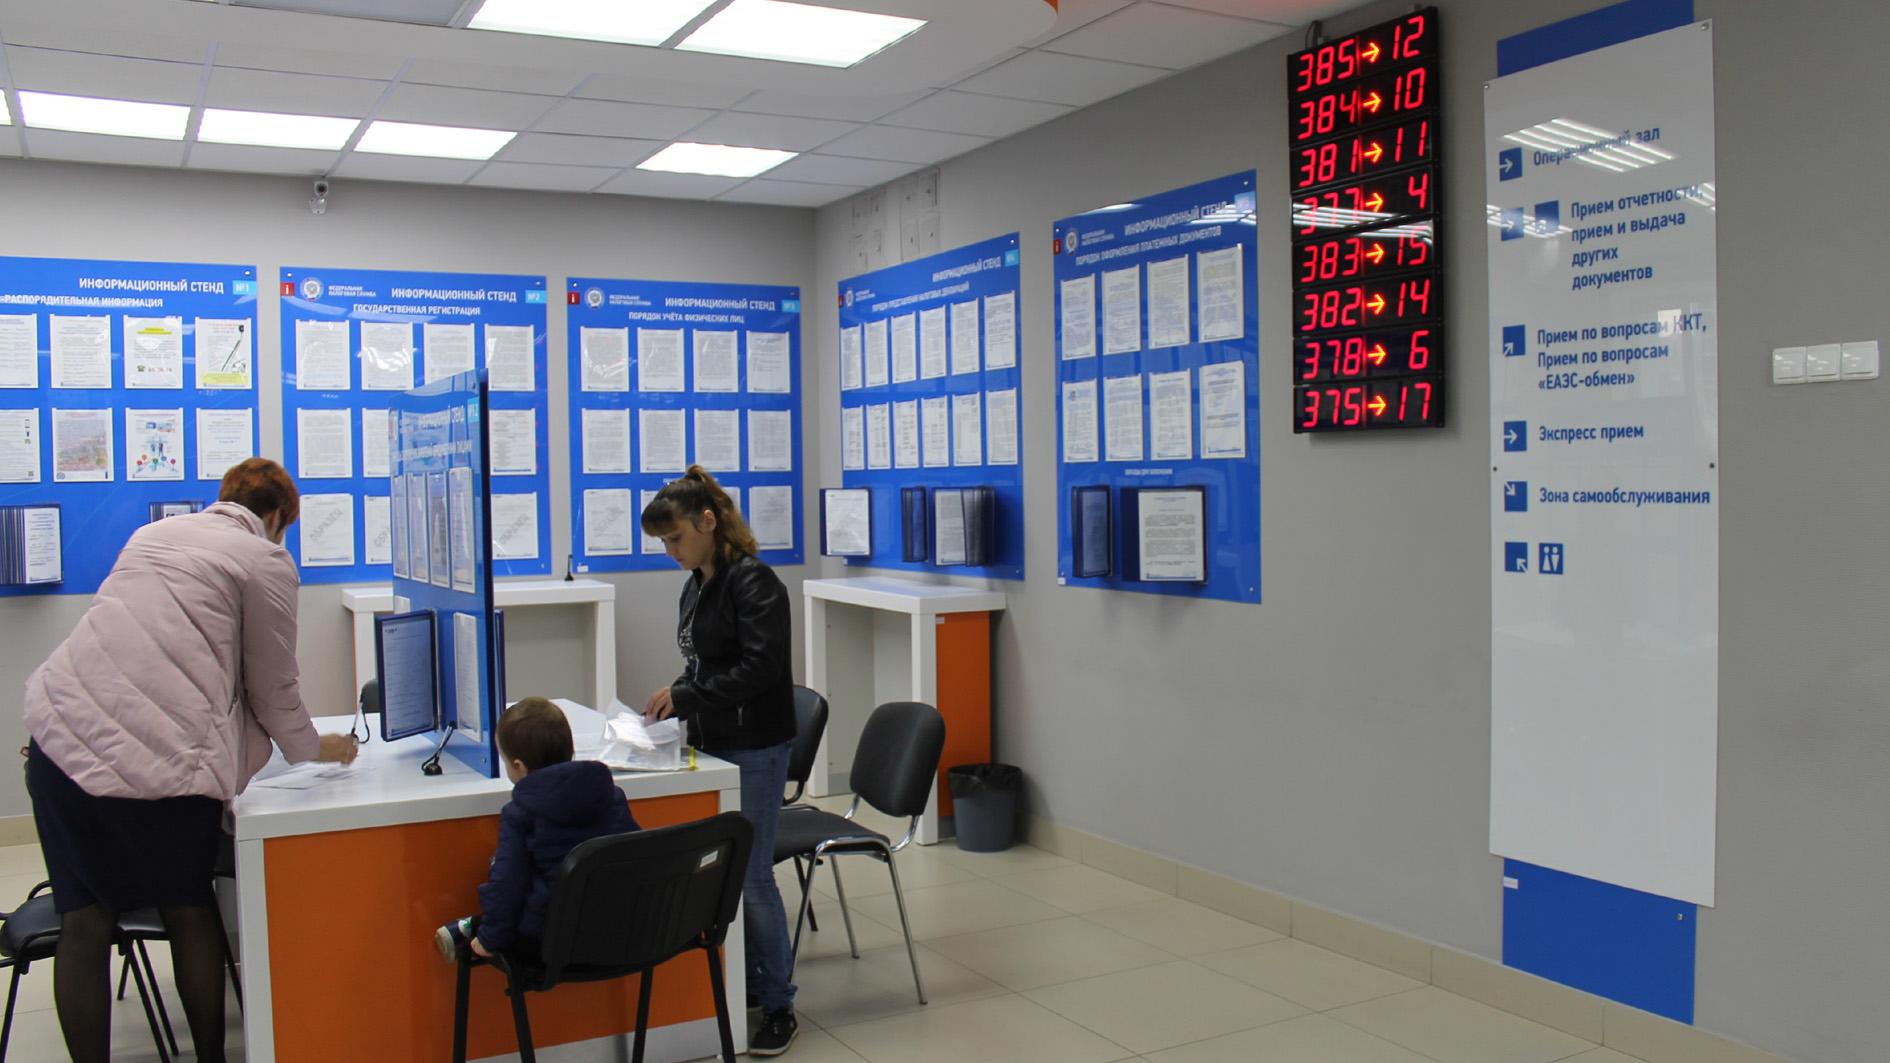 как взять кредит в банкомате по паспорту